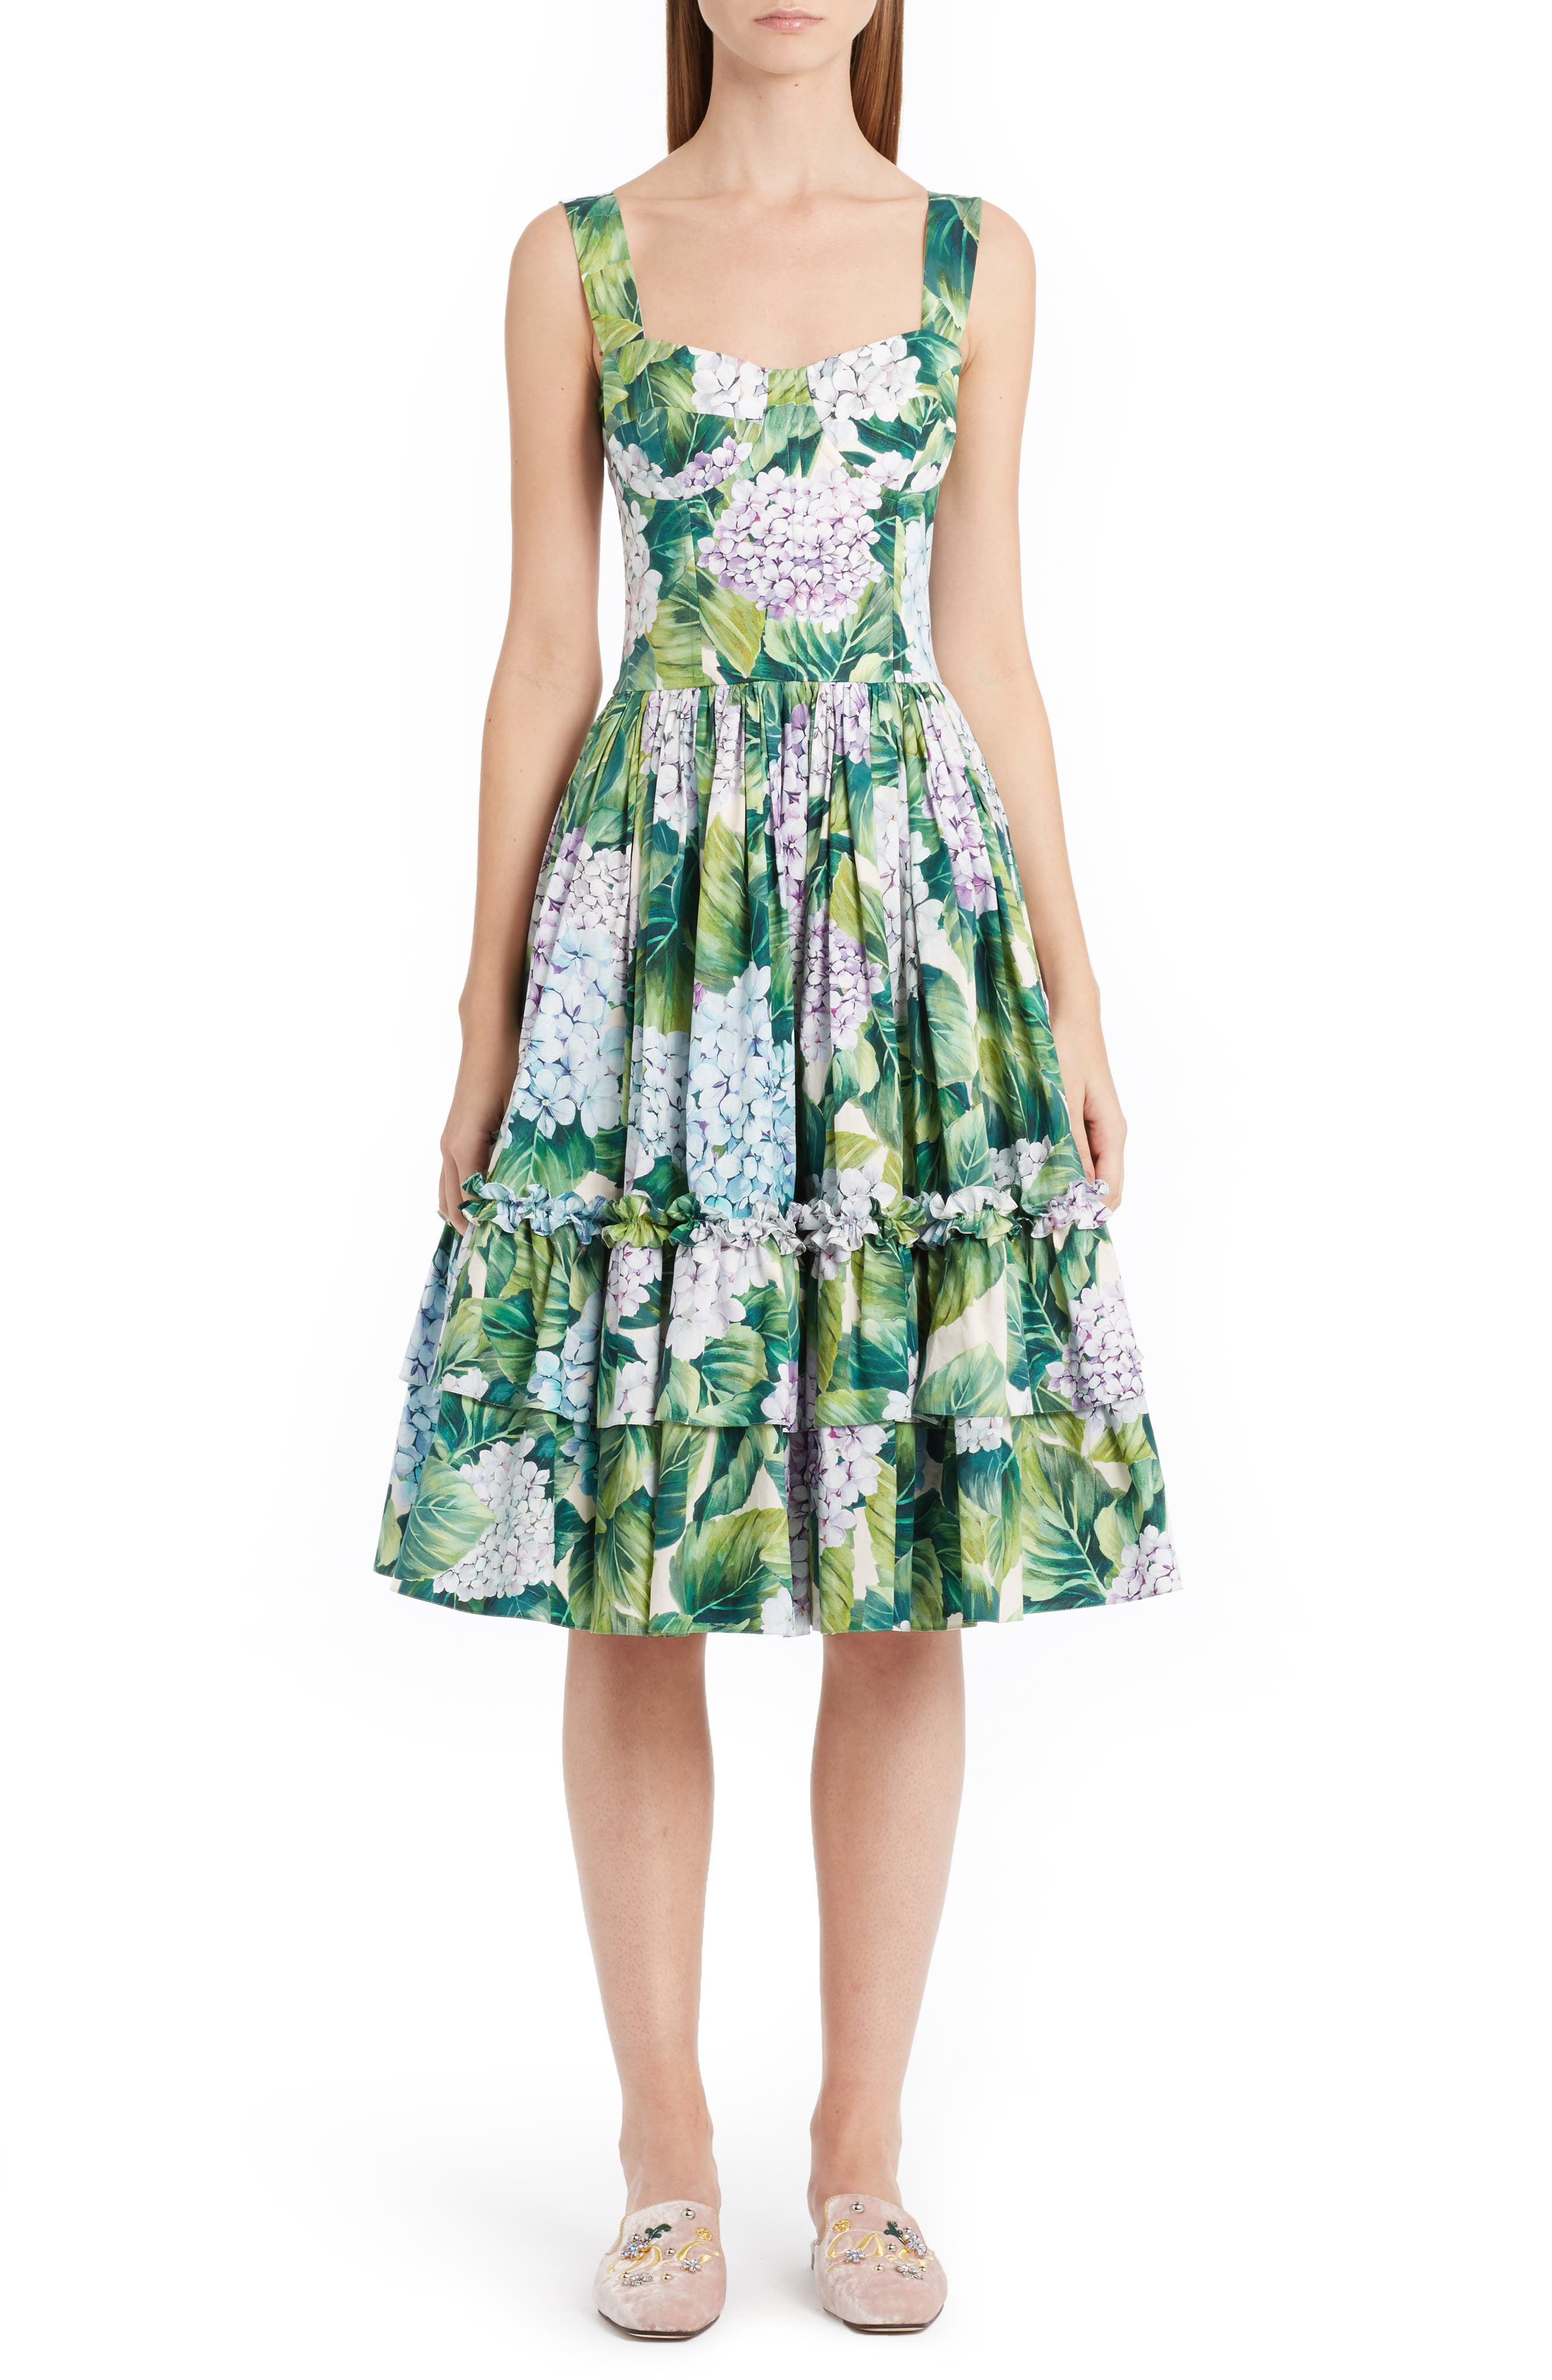 Dolce&Gabbana Hydrangea Print Fit & Flare Dress